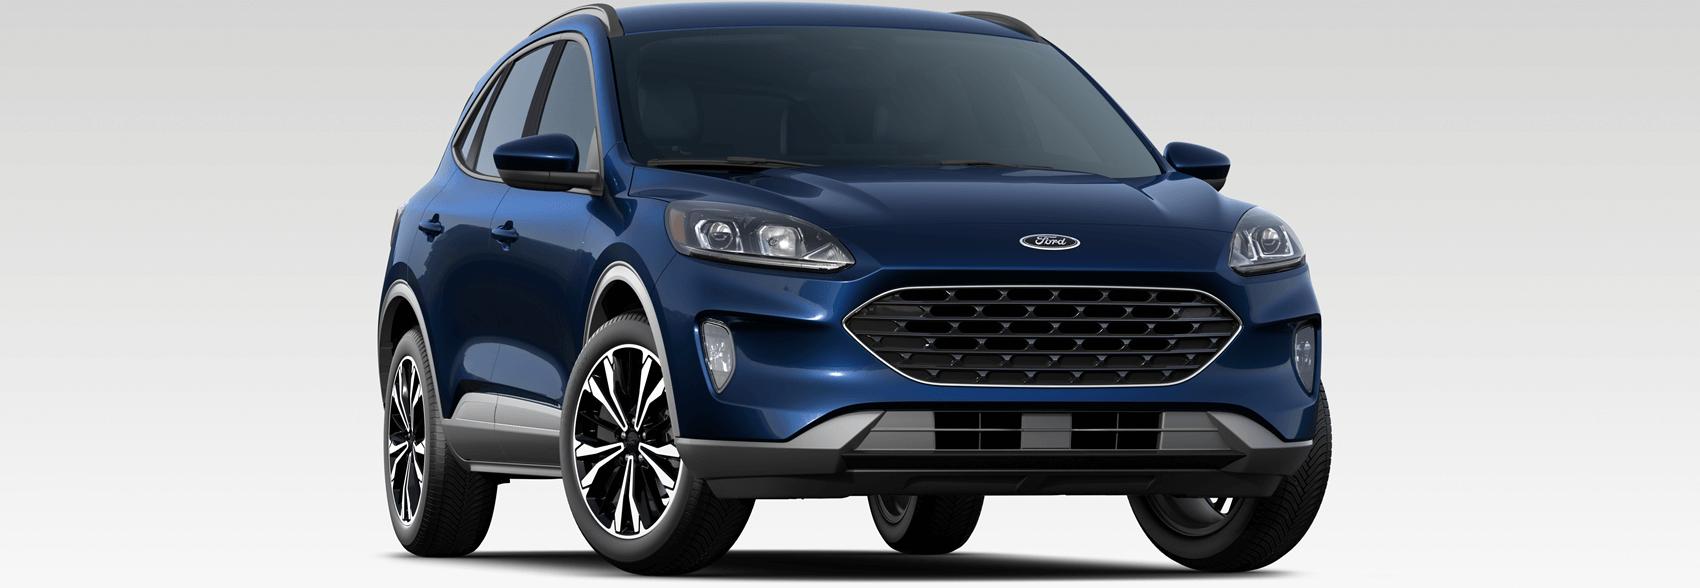 Ford Escape Trim Levels